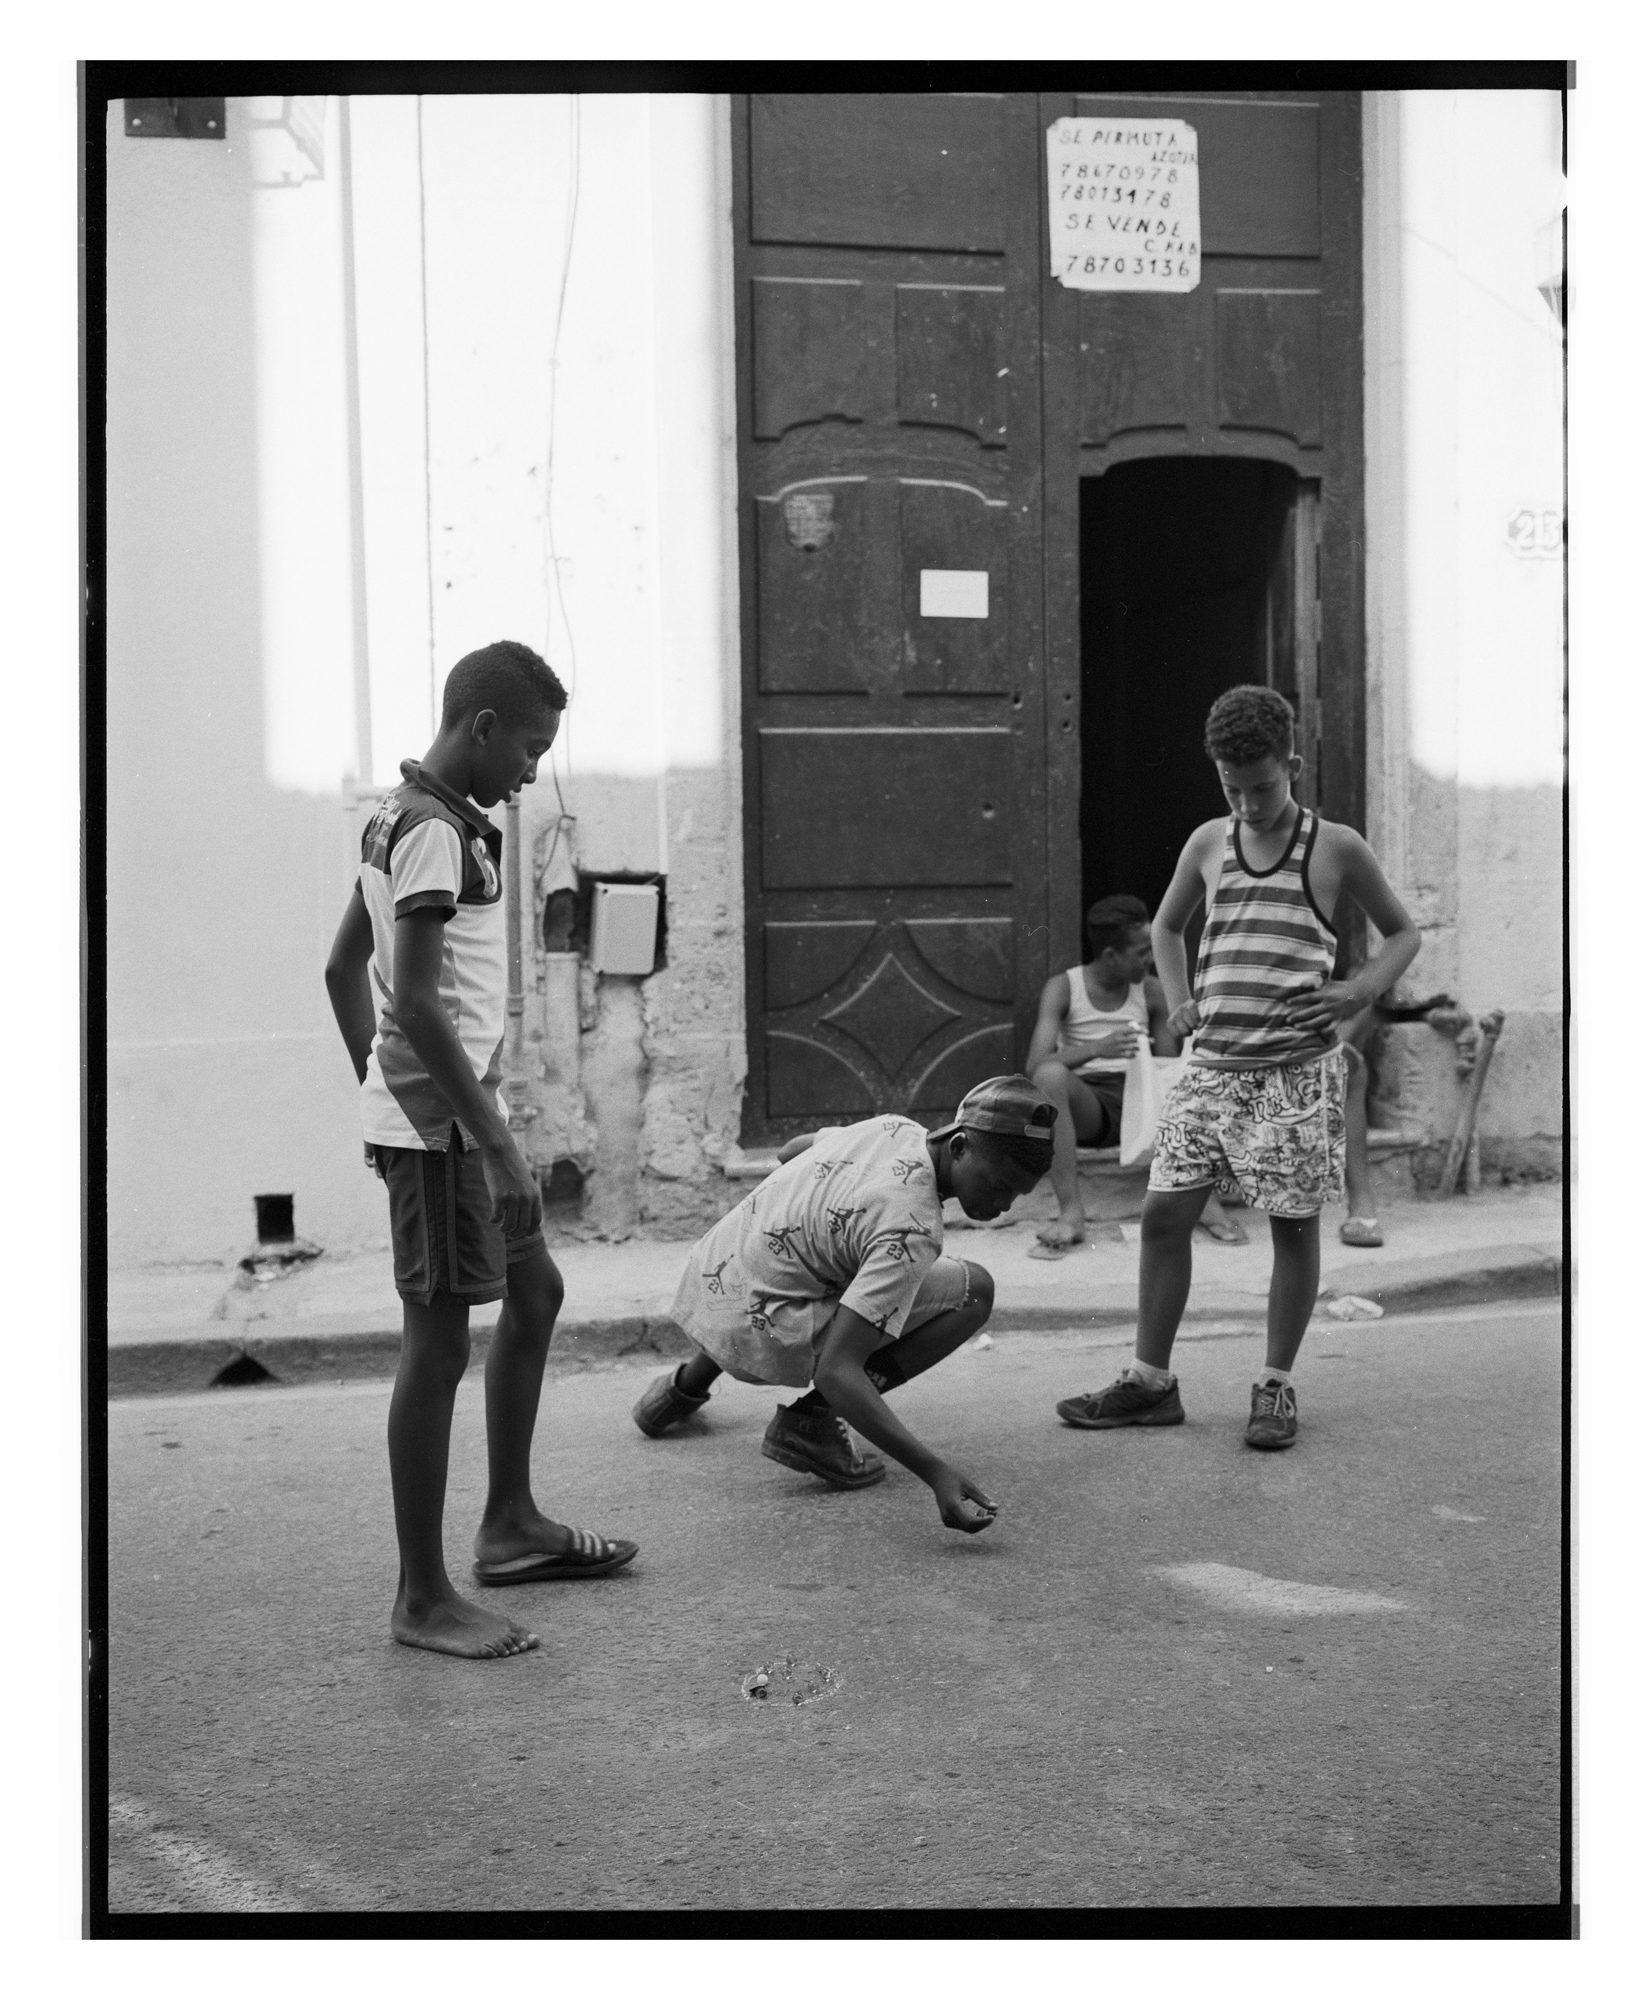 Cuba by Brett Hillyard on ILFORD black and white HP5+ Film